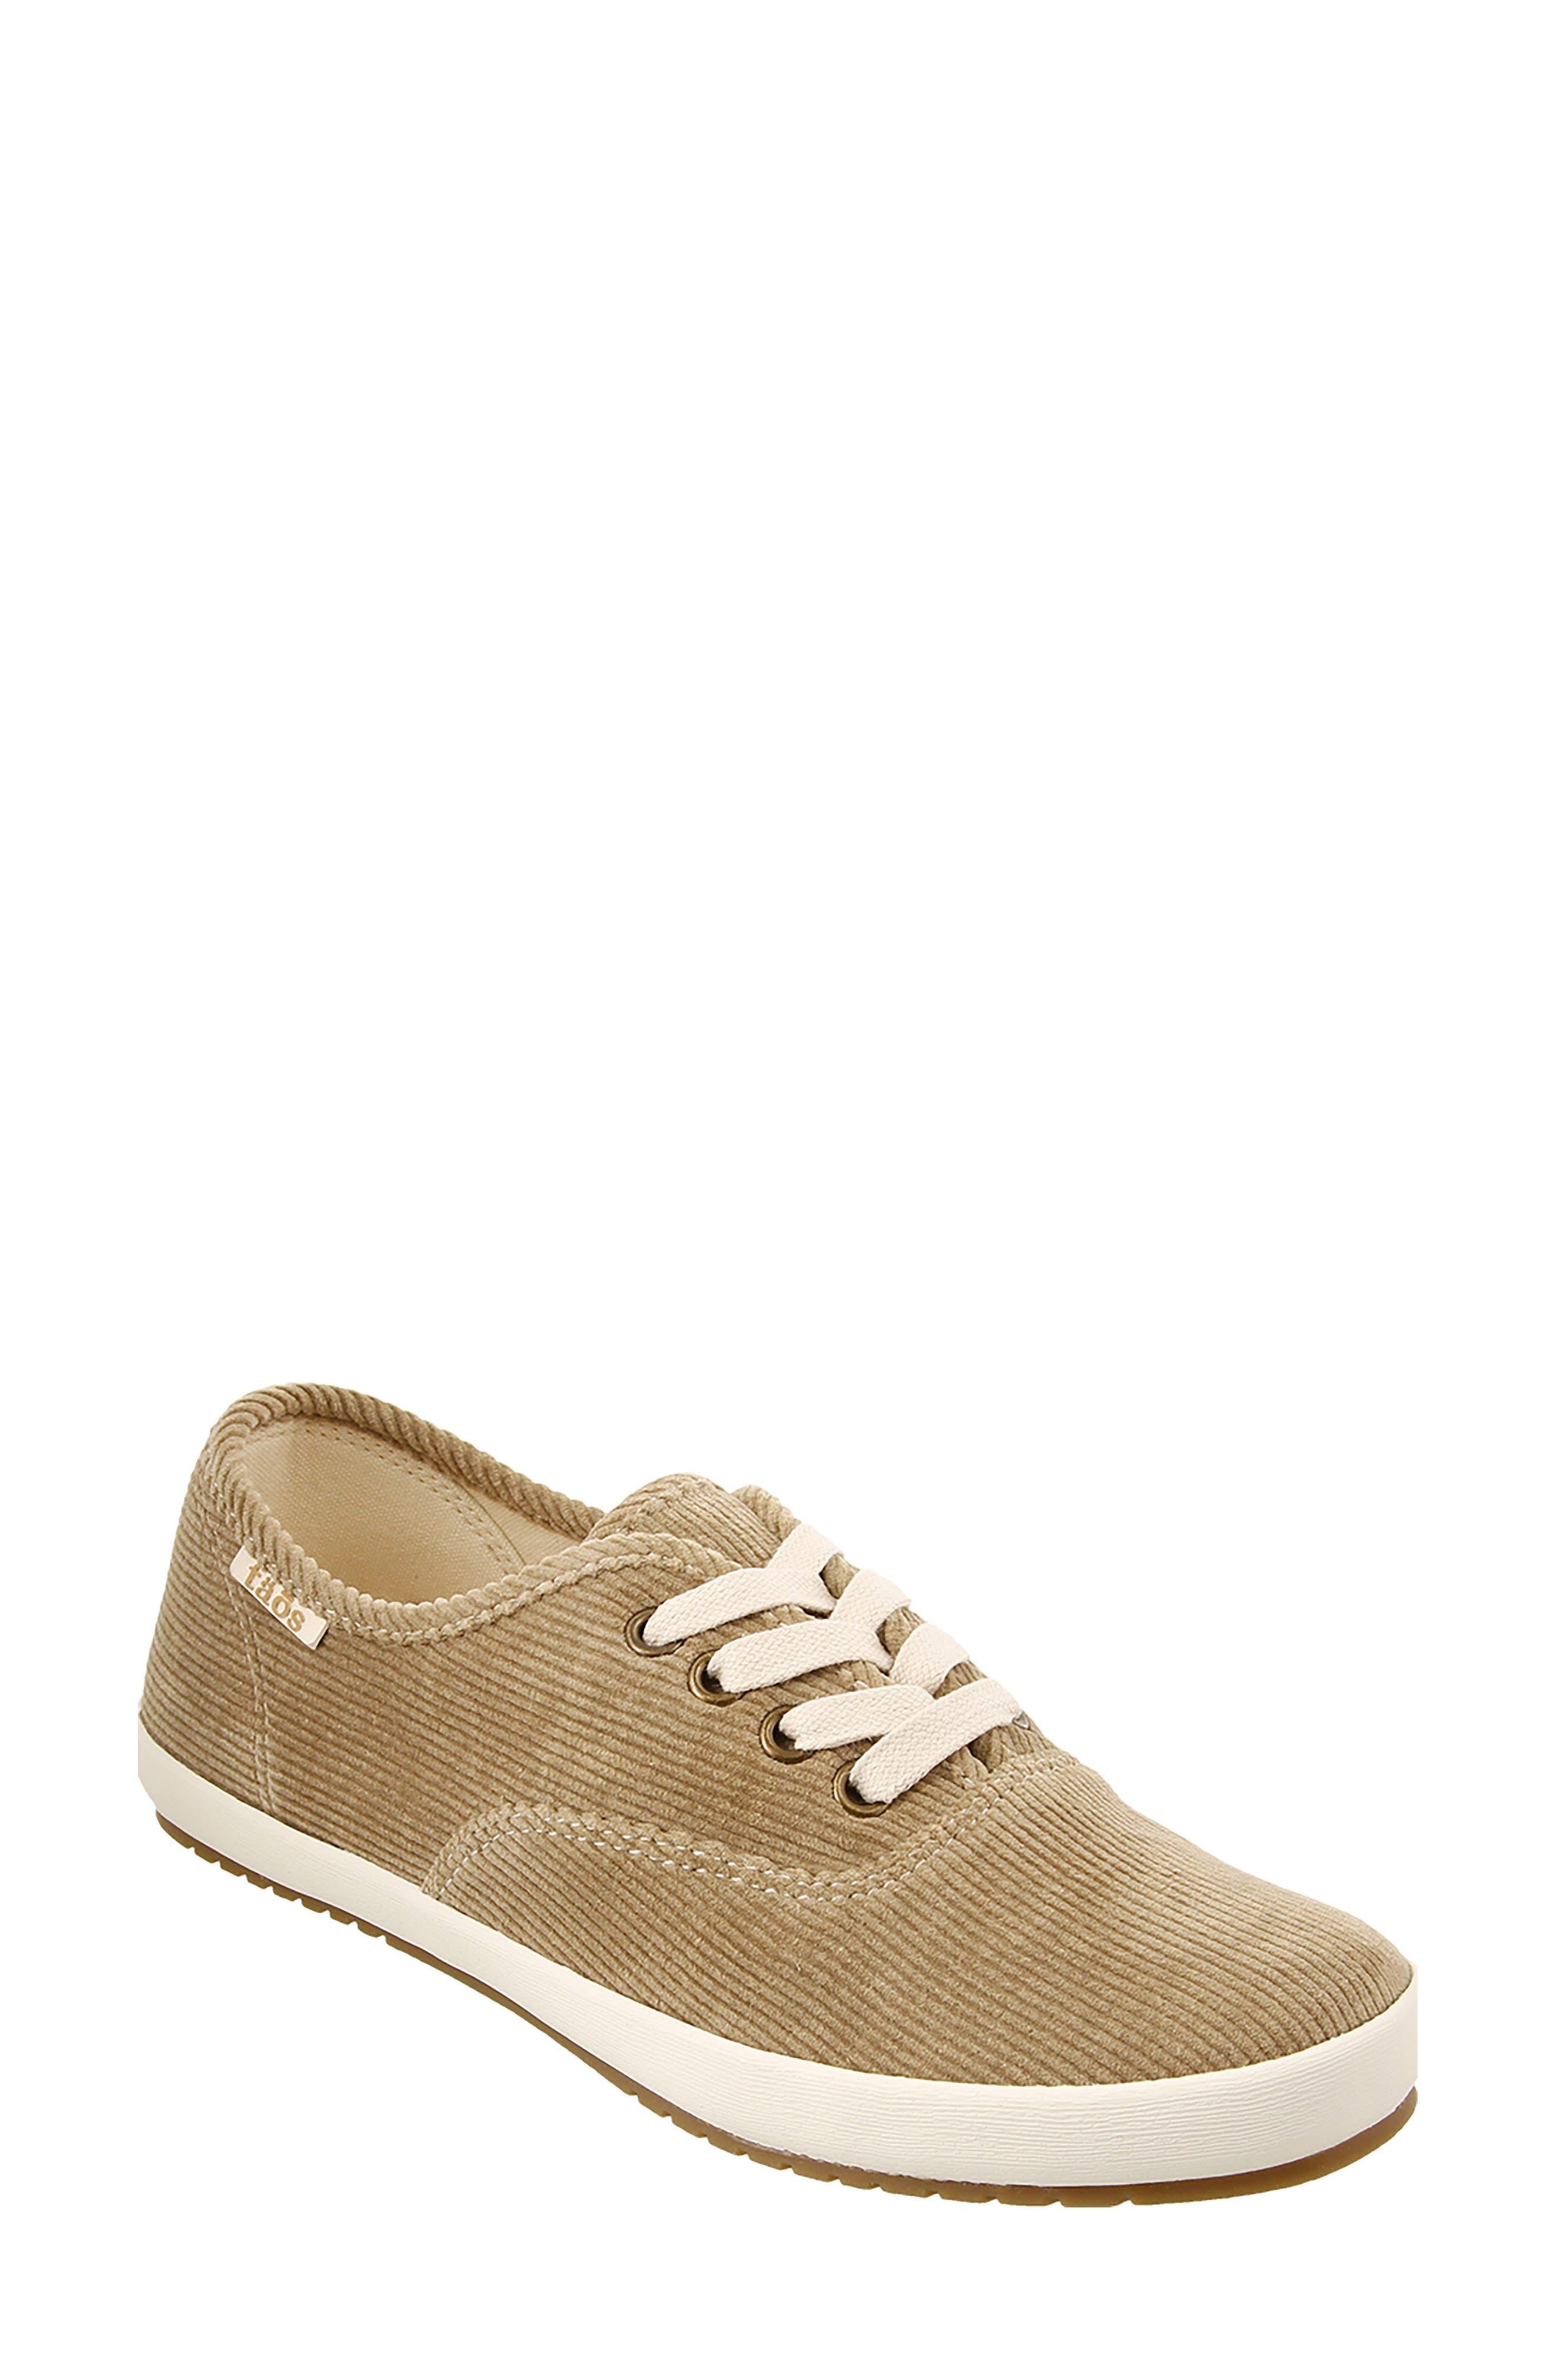 Guest Star Sneaker,                         Main,                         color, KHAKI CORD FABRIC